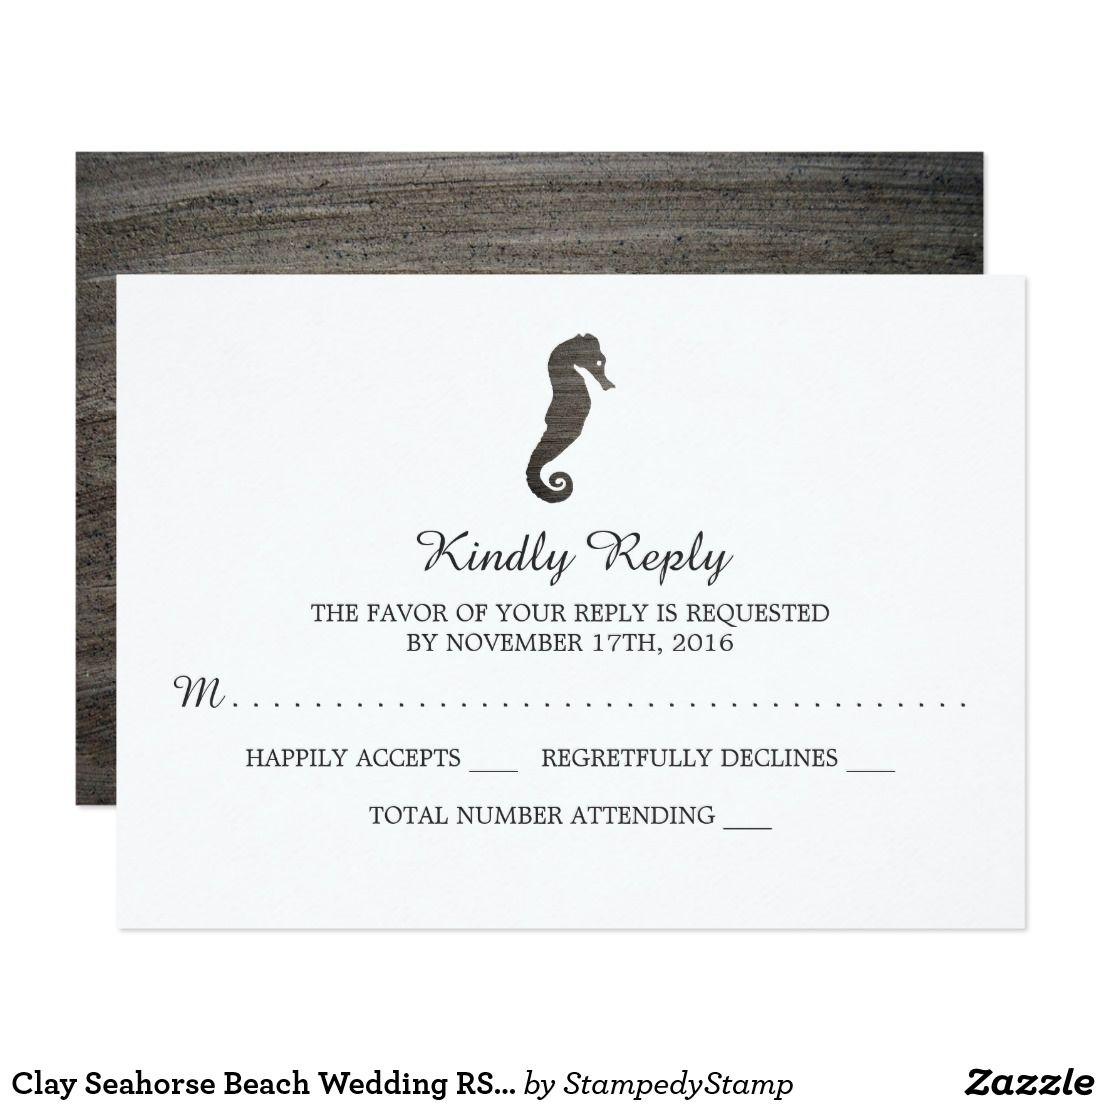 Clay Seahorse Beach Wedding RSVP Card | Wedding rsvp, Seahorses and Rsvp